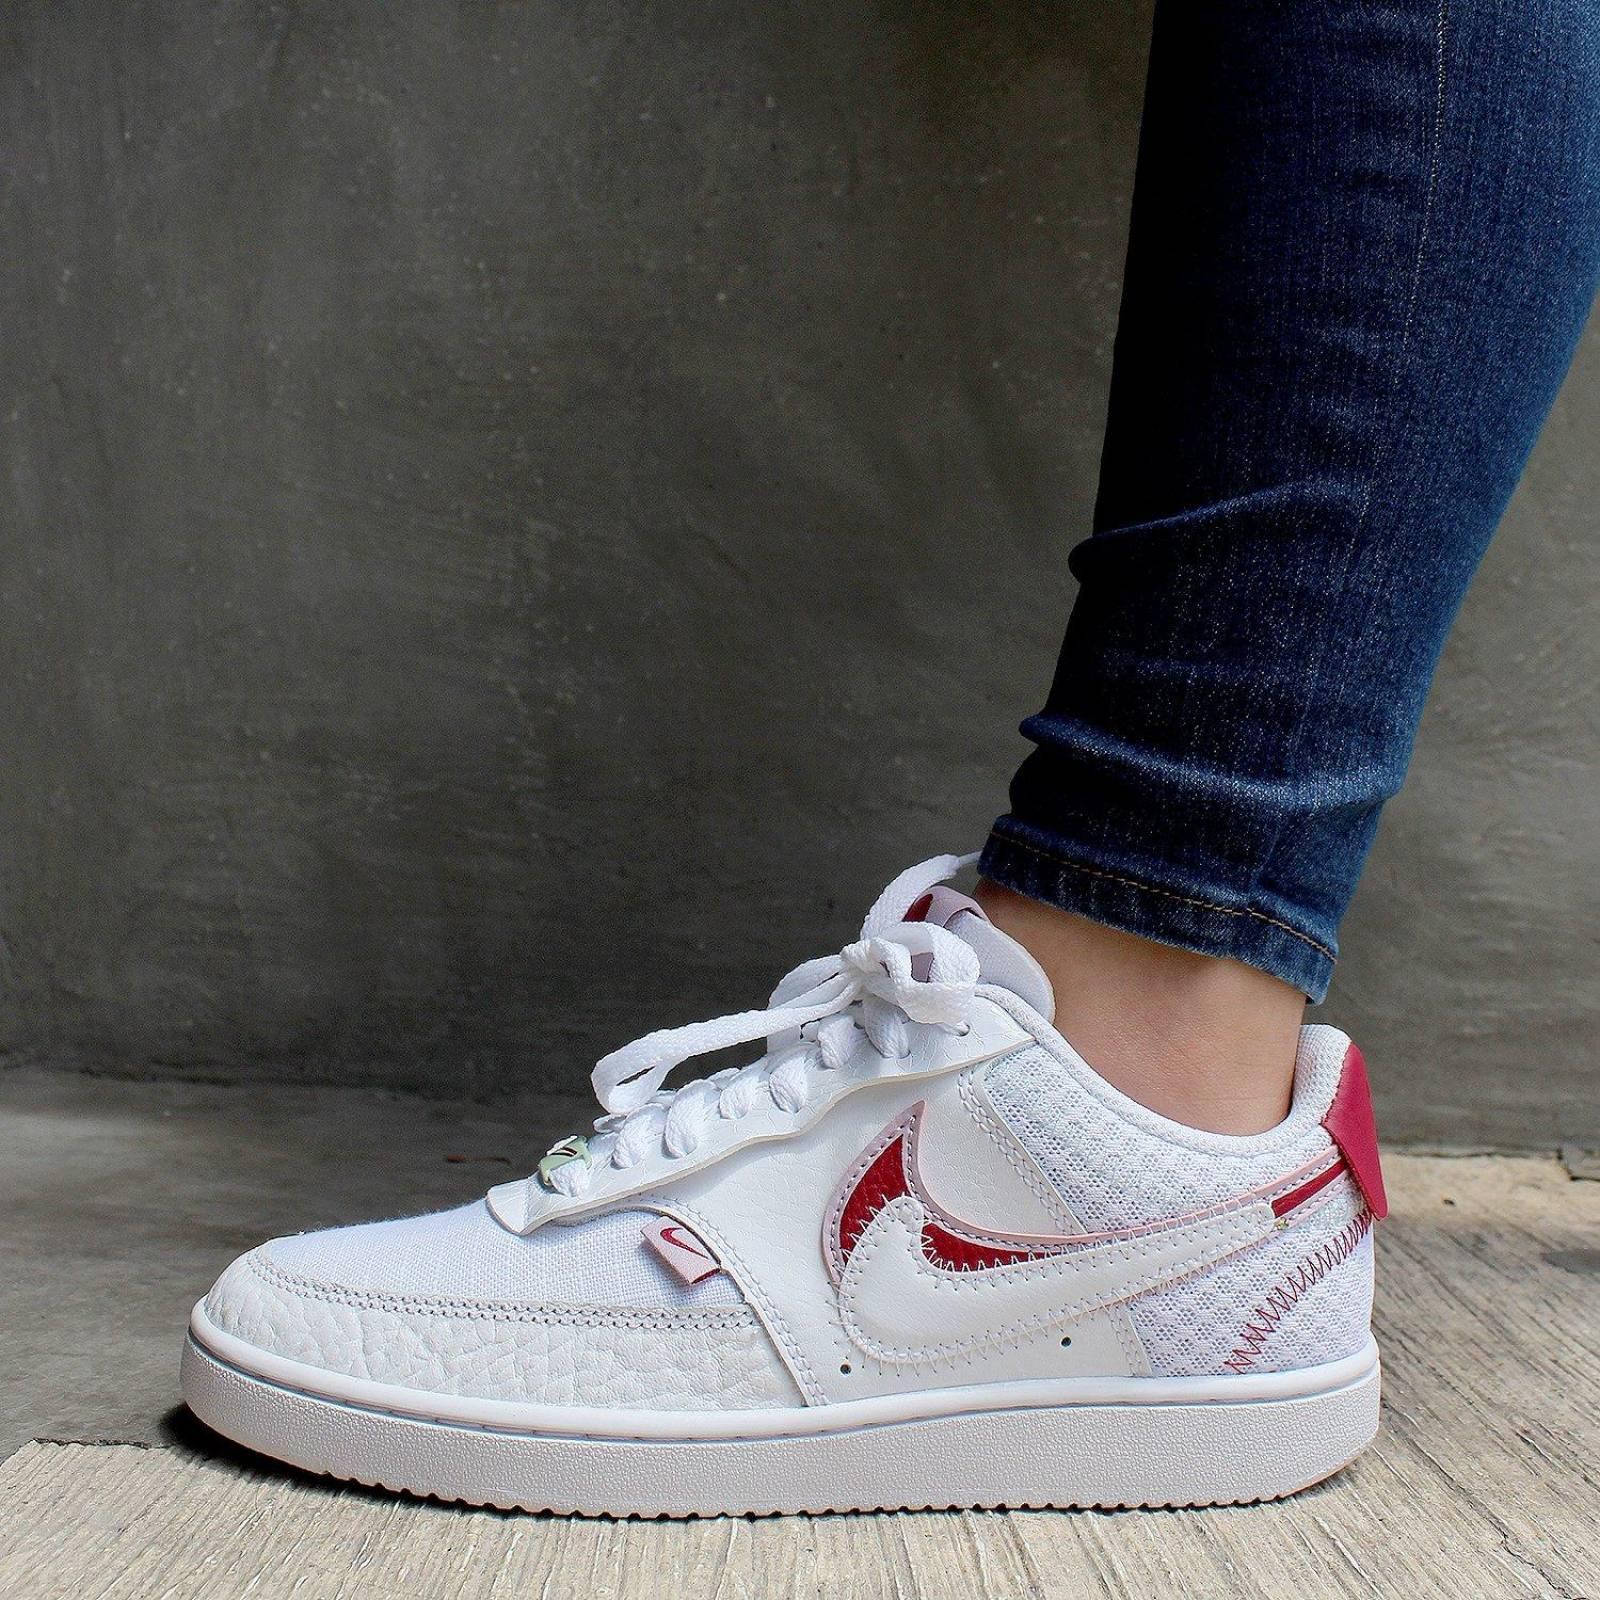 Tenis Nike Court Vision Low Premium - CI7827100 - Blanco - Mujer